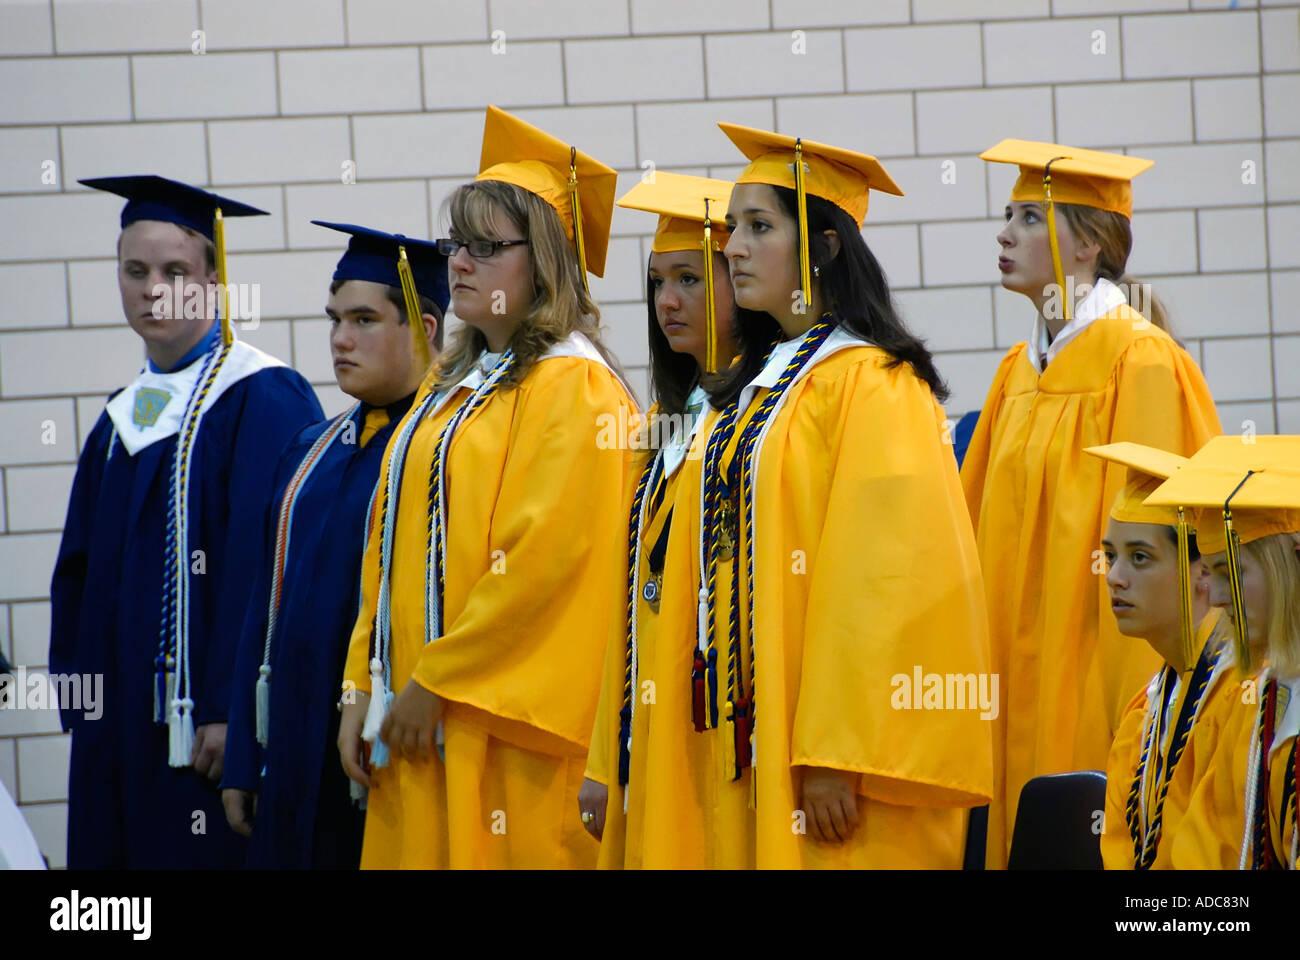 Ceremonies for graduating high school students - Stock Image